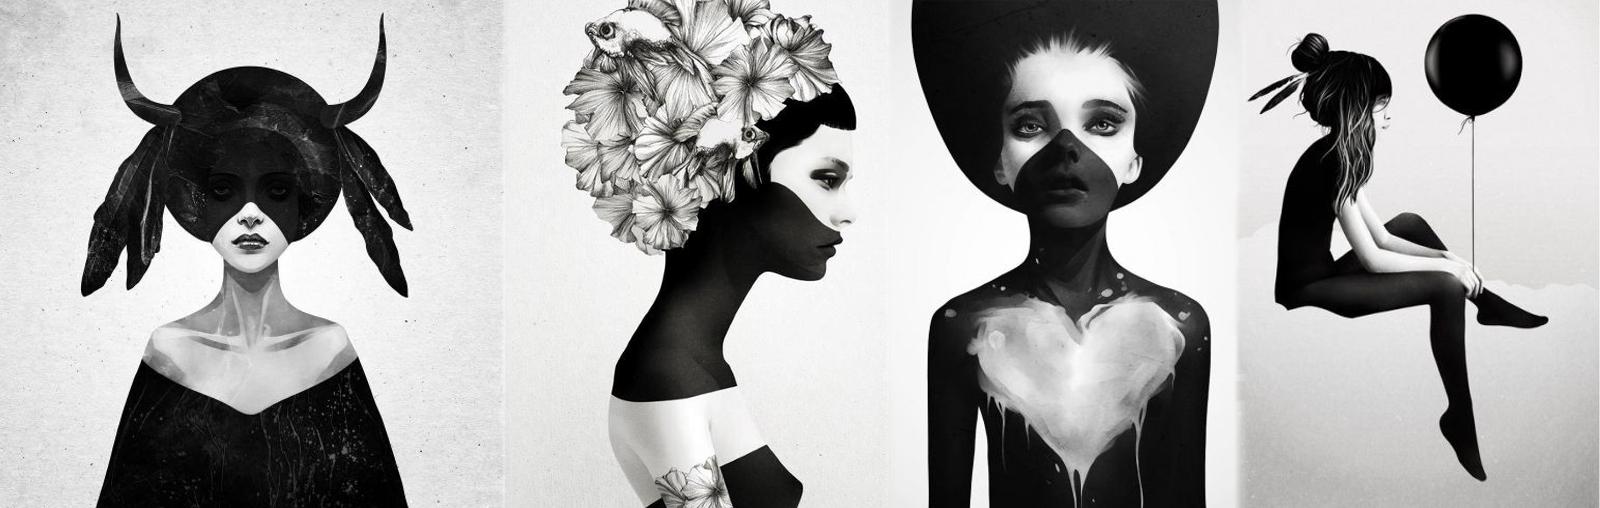 Designový černobílý plakát